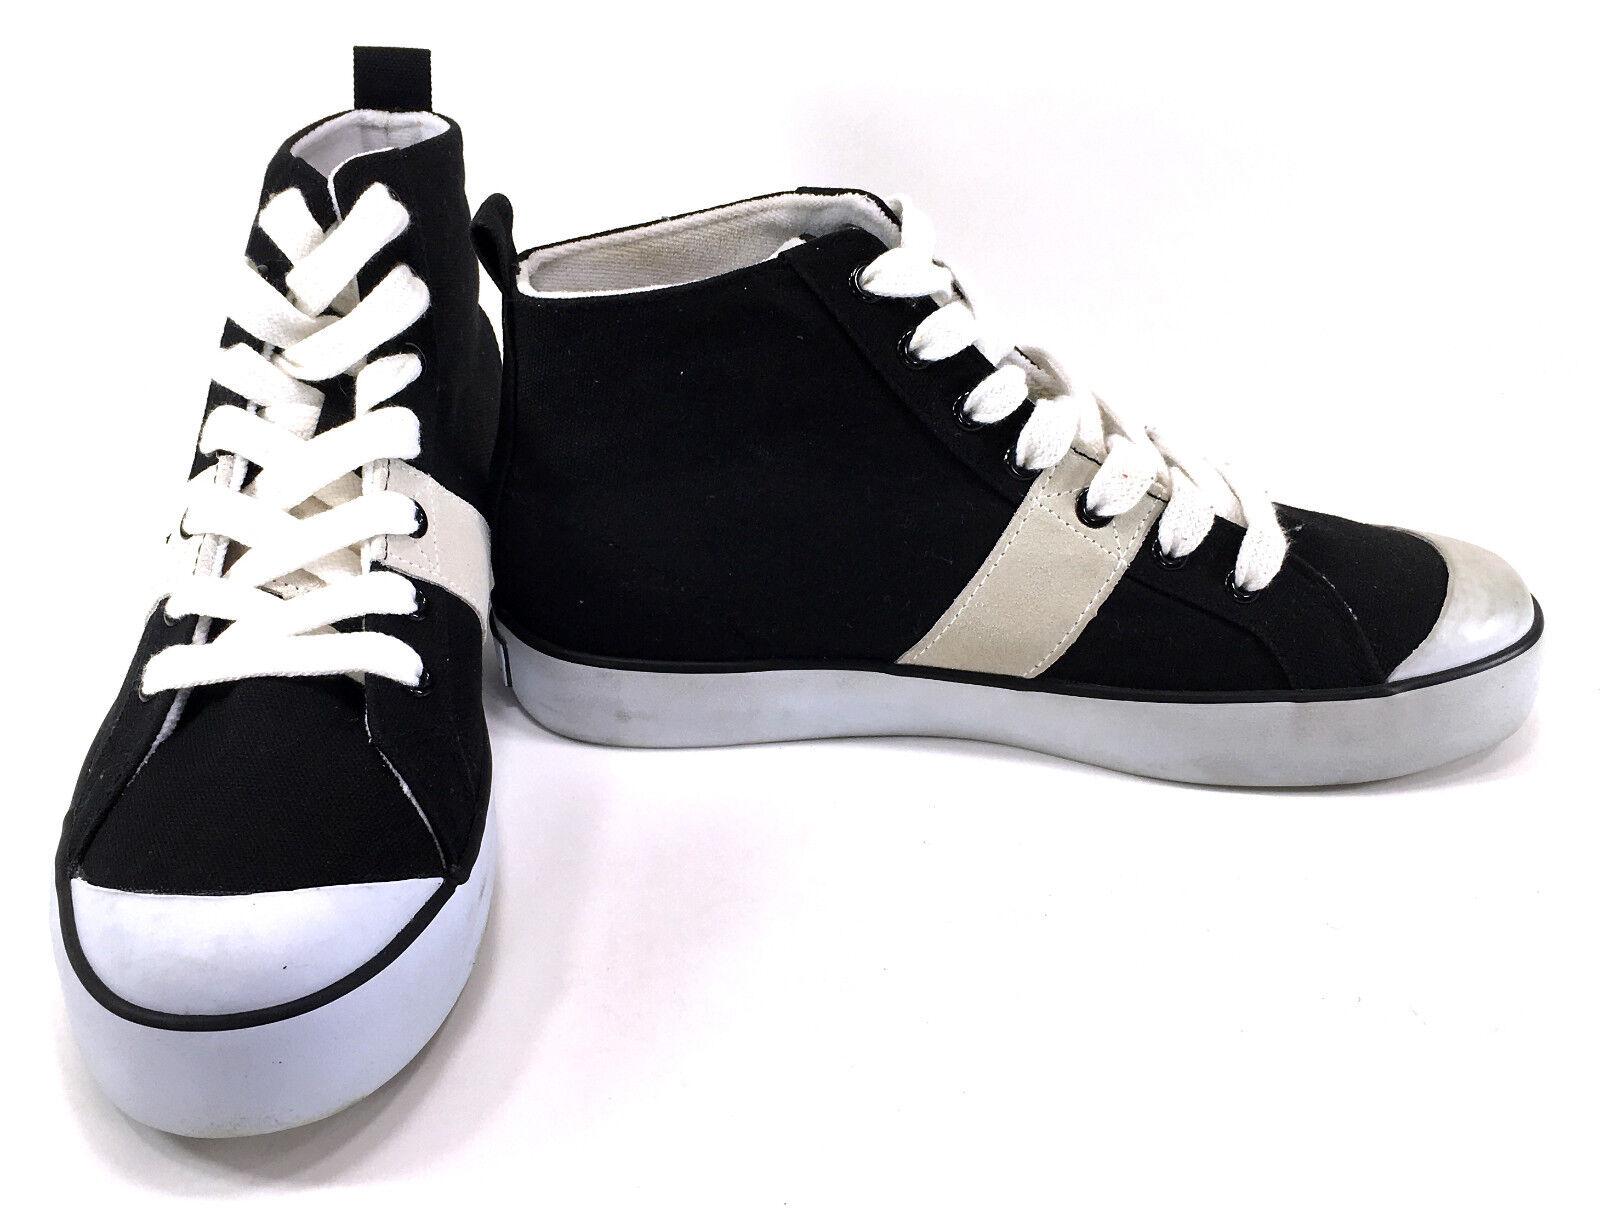 Polo Ralph Lauren shoes Conrad Canvas Black White Sneakers Size 7.5